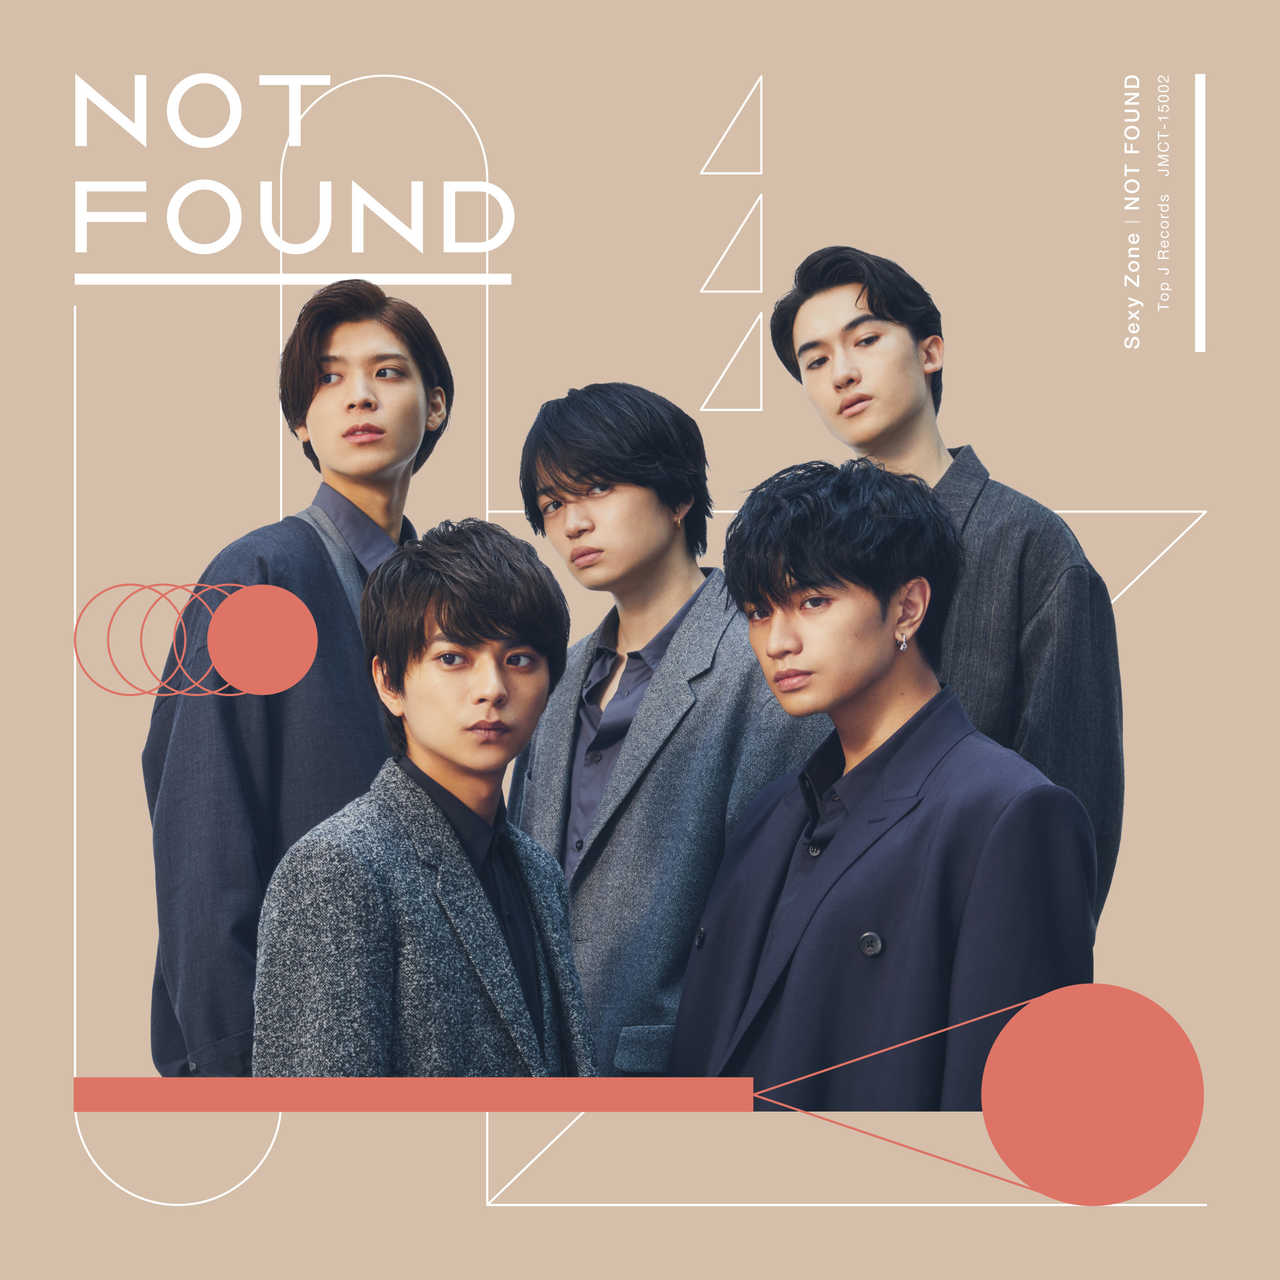 Sexy Zone 11月4日リリース シングル「NOT FOUND」収録 初のダンス映像解禁!